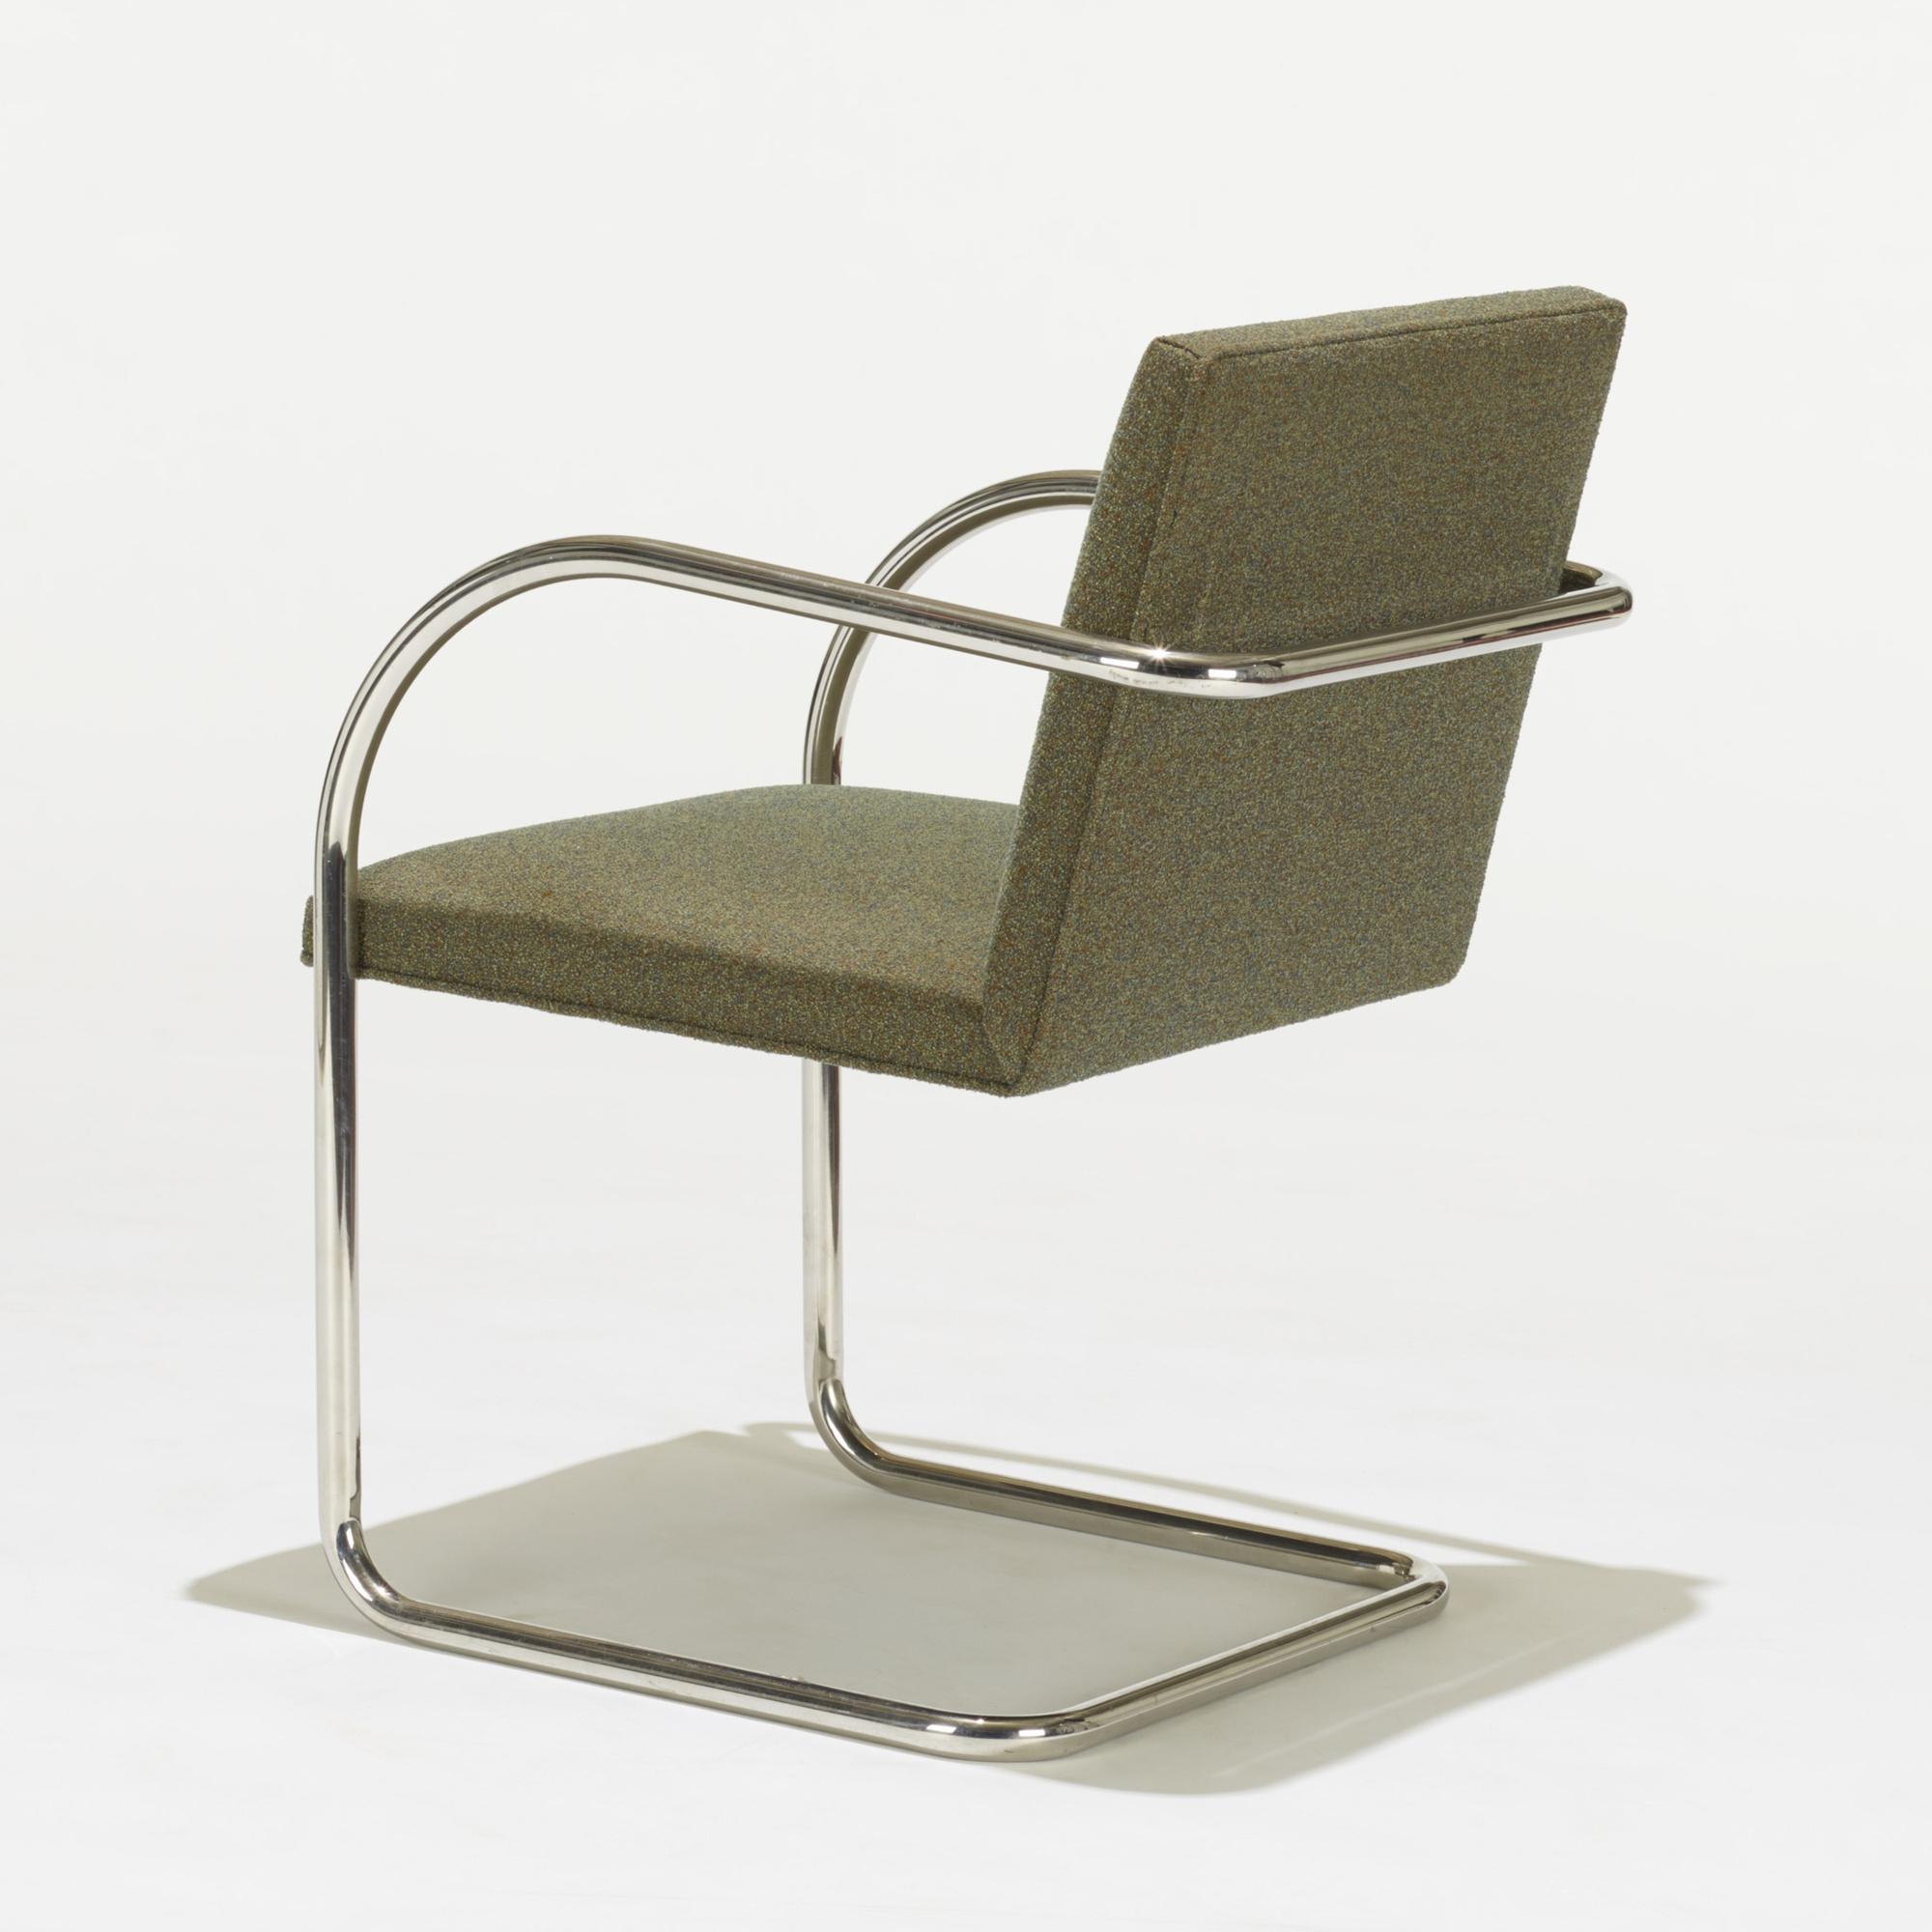 266 Ludwig Mies Van Der Rohe Brno Chairs Pair American Design